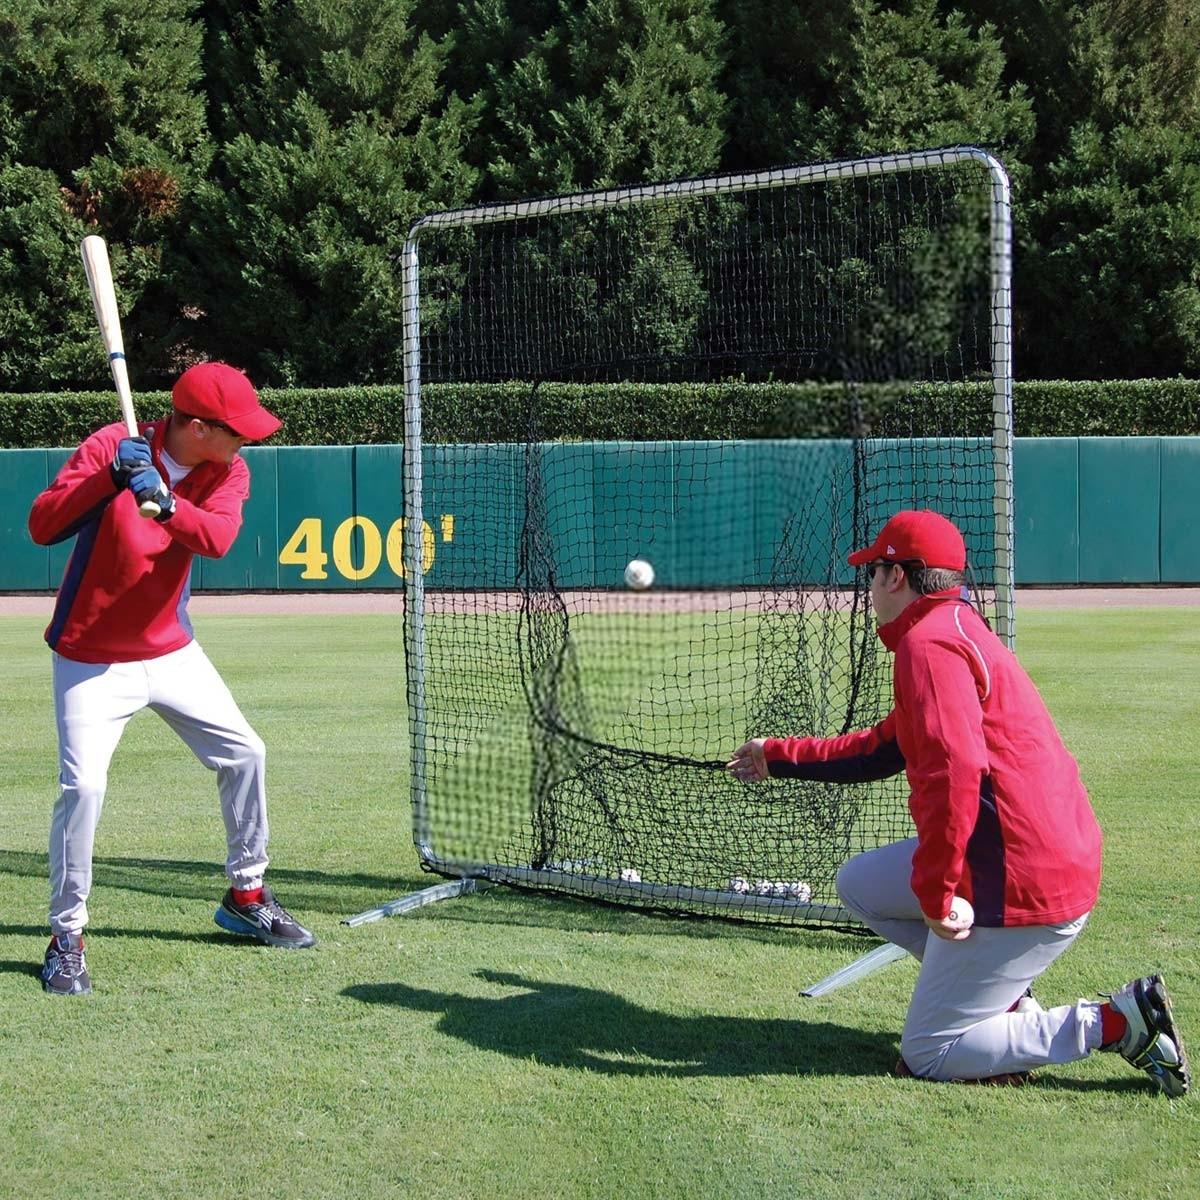 Procage Baseball Softball Batting Practice Frame Amp Sock